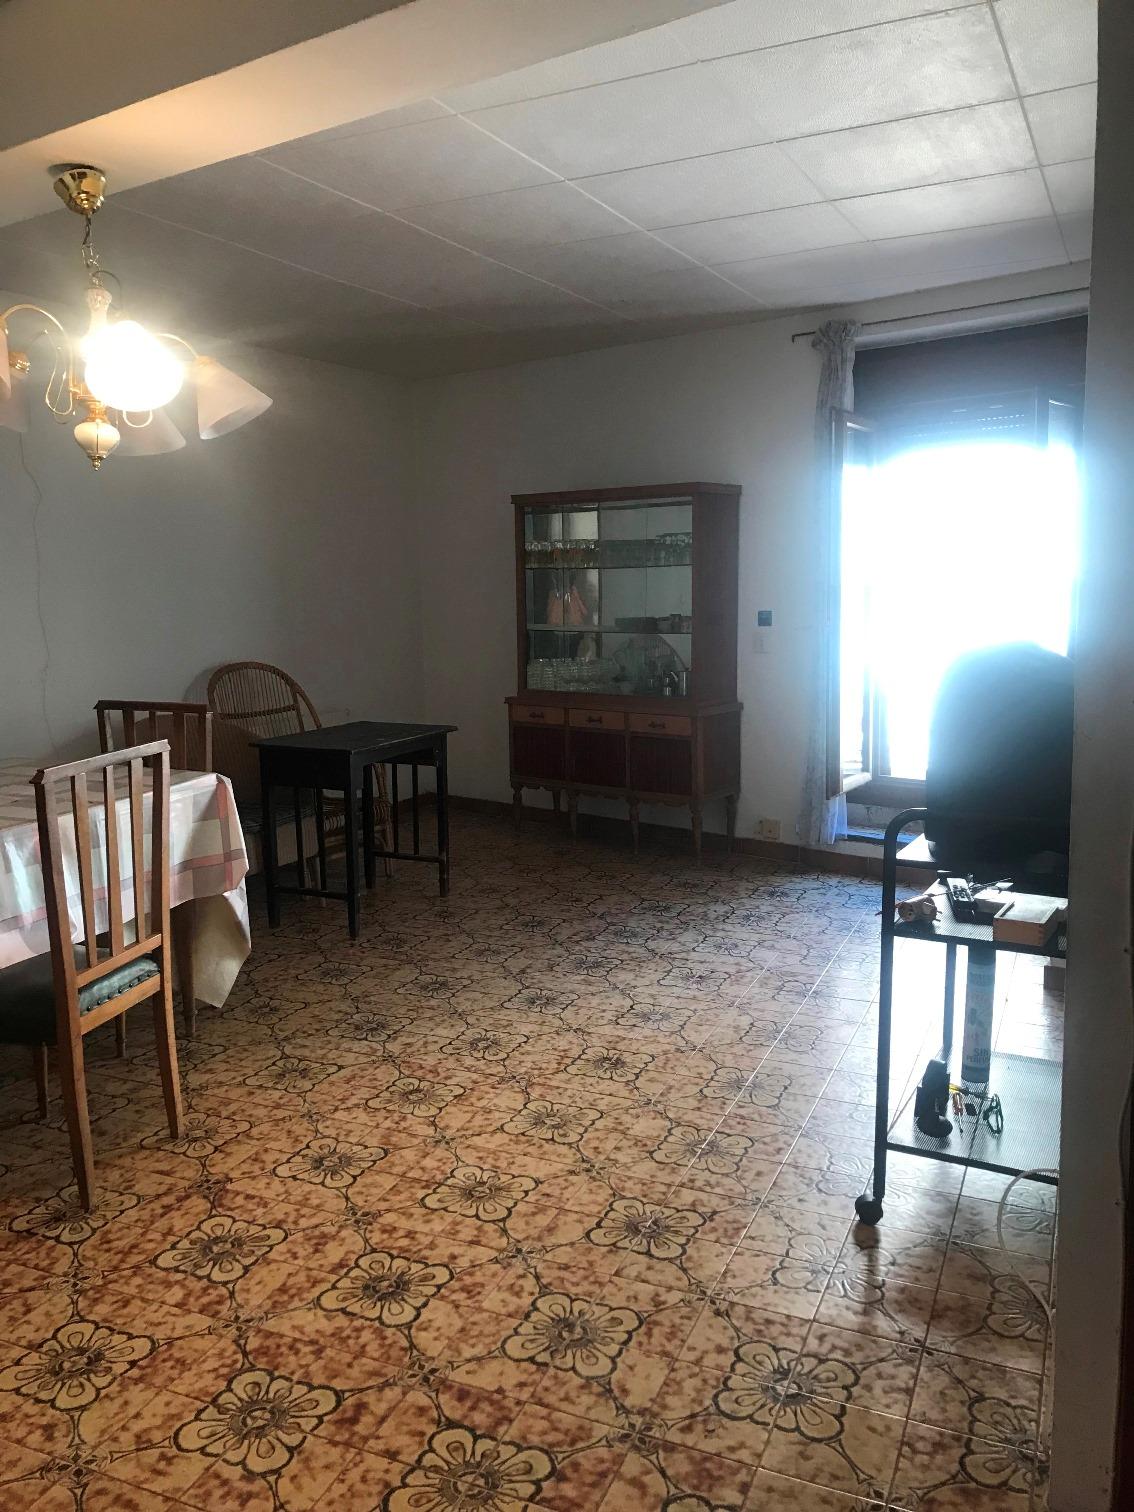 PRATD E COMTE, 5 Bedrooms Bedrooms, 3 Rooms Rooms,2 BathroomsBathrooms,Casa de Poble,Urbana,PRATD E COMTE,1169